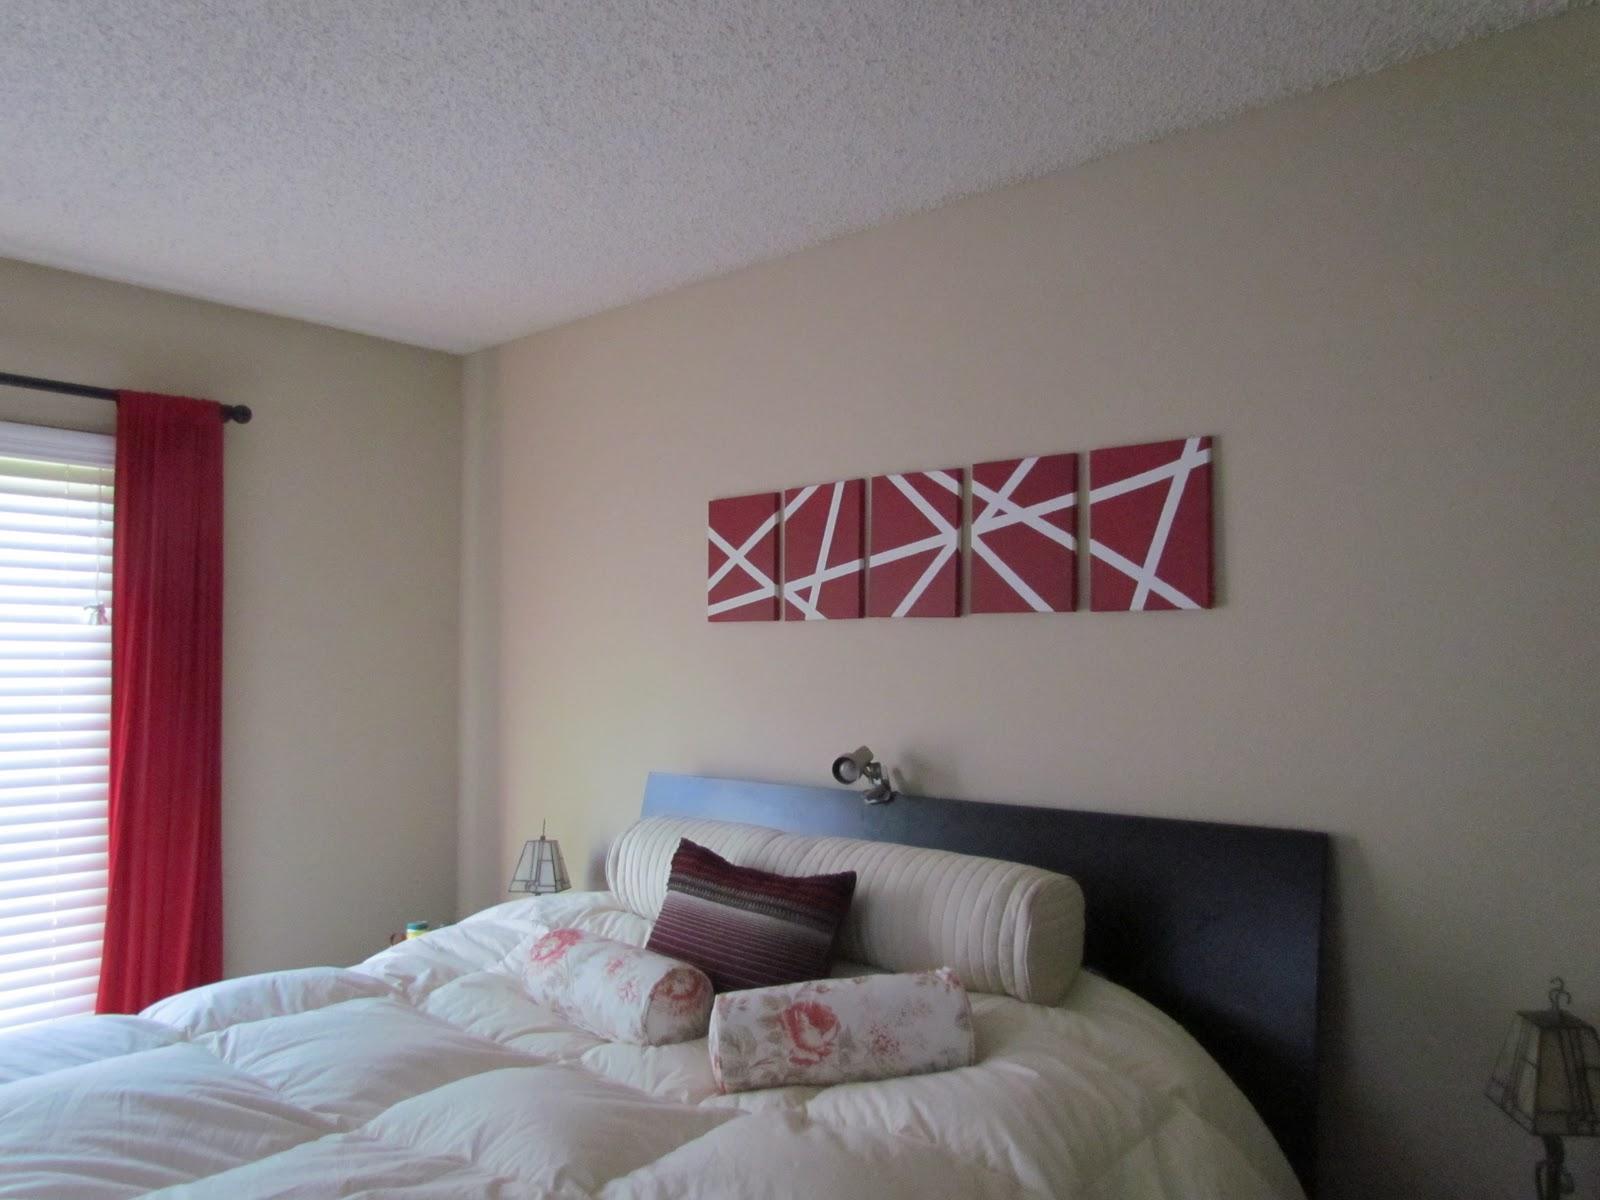 Pinterest canvas painting ideas 2015 home design ideas for Diy light art